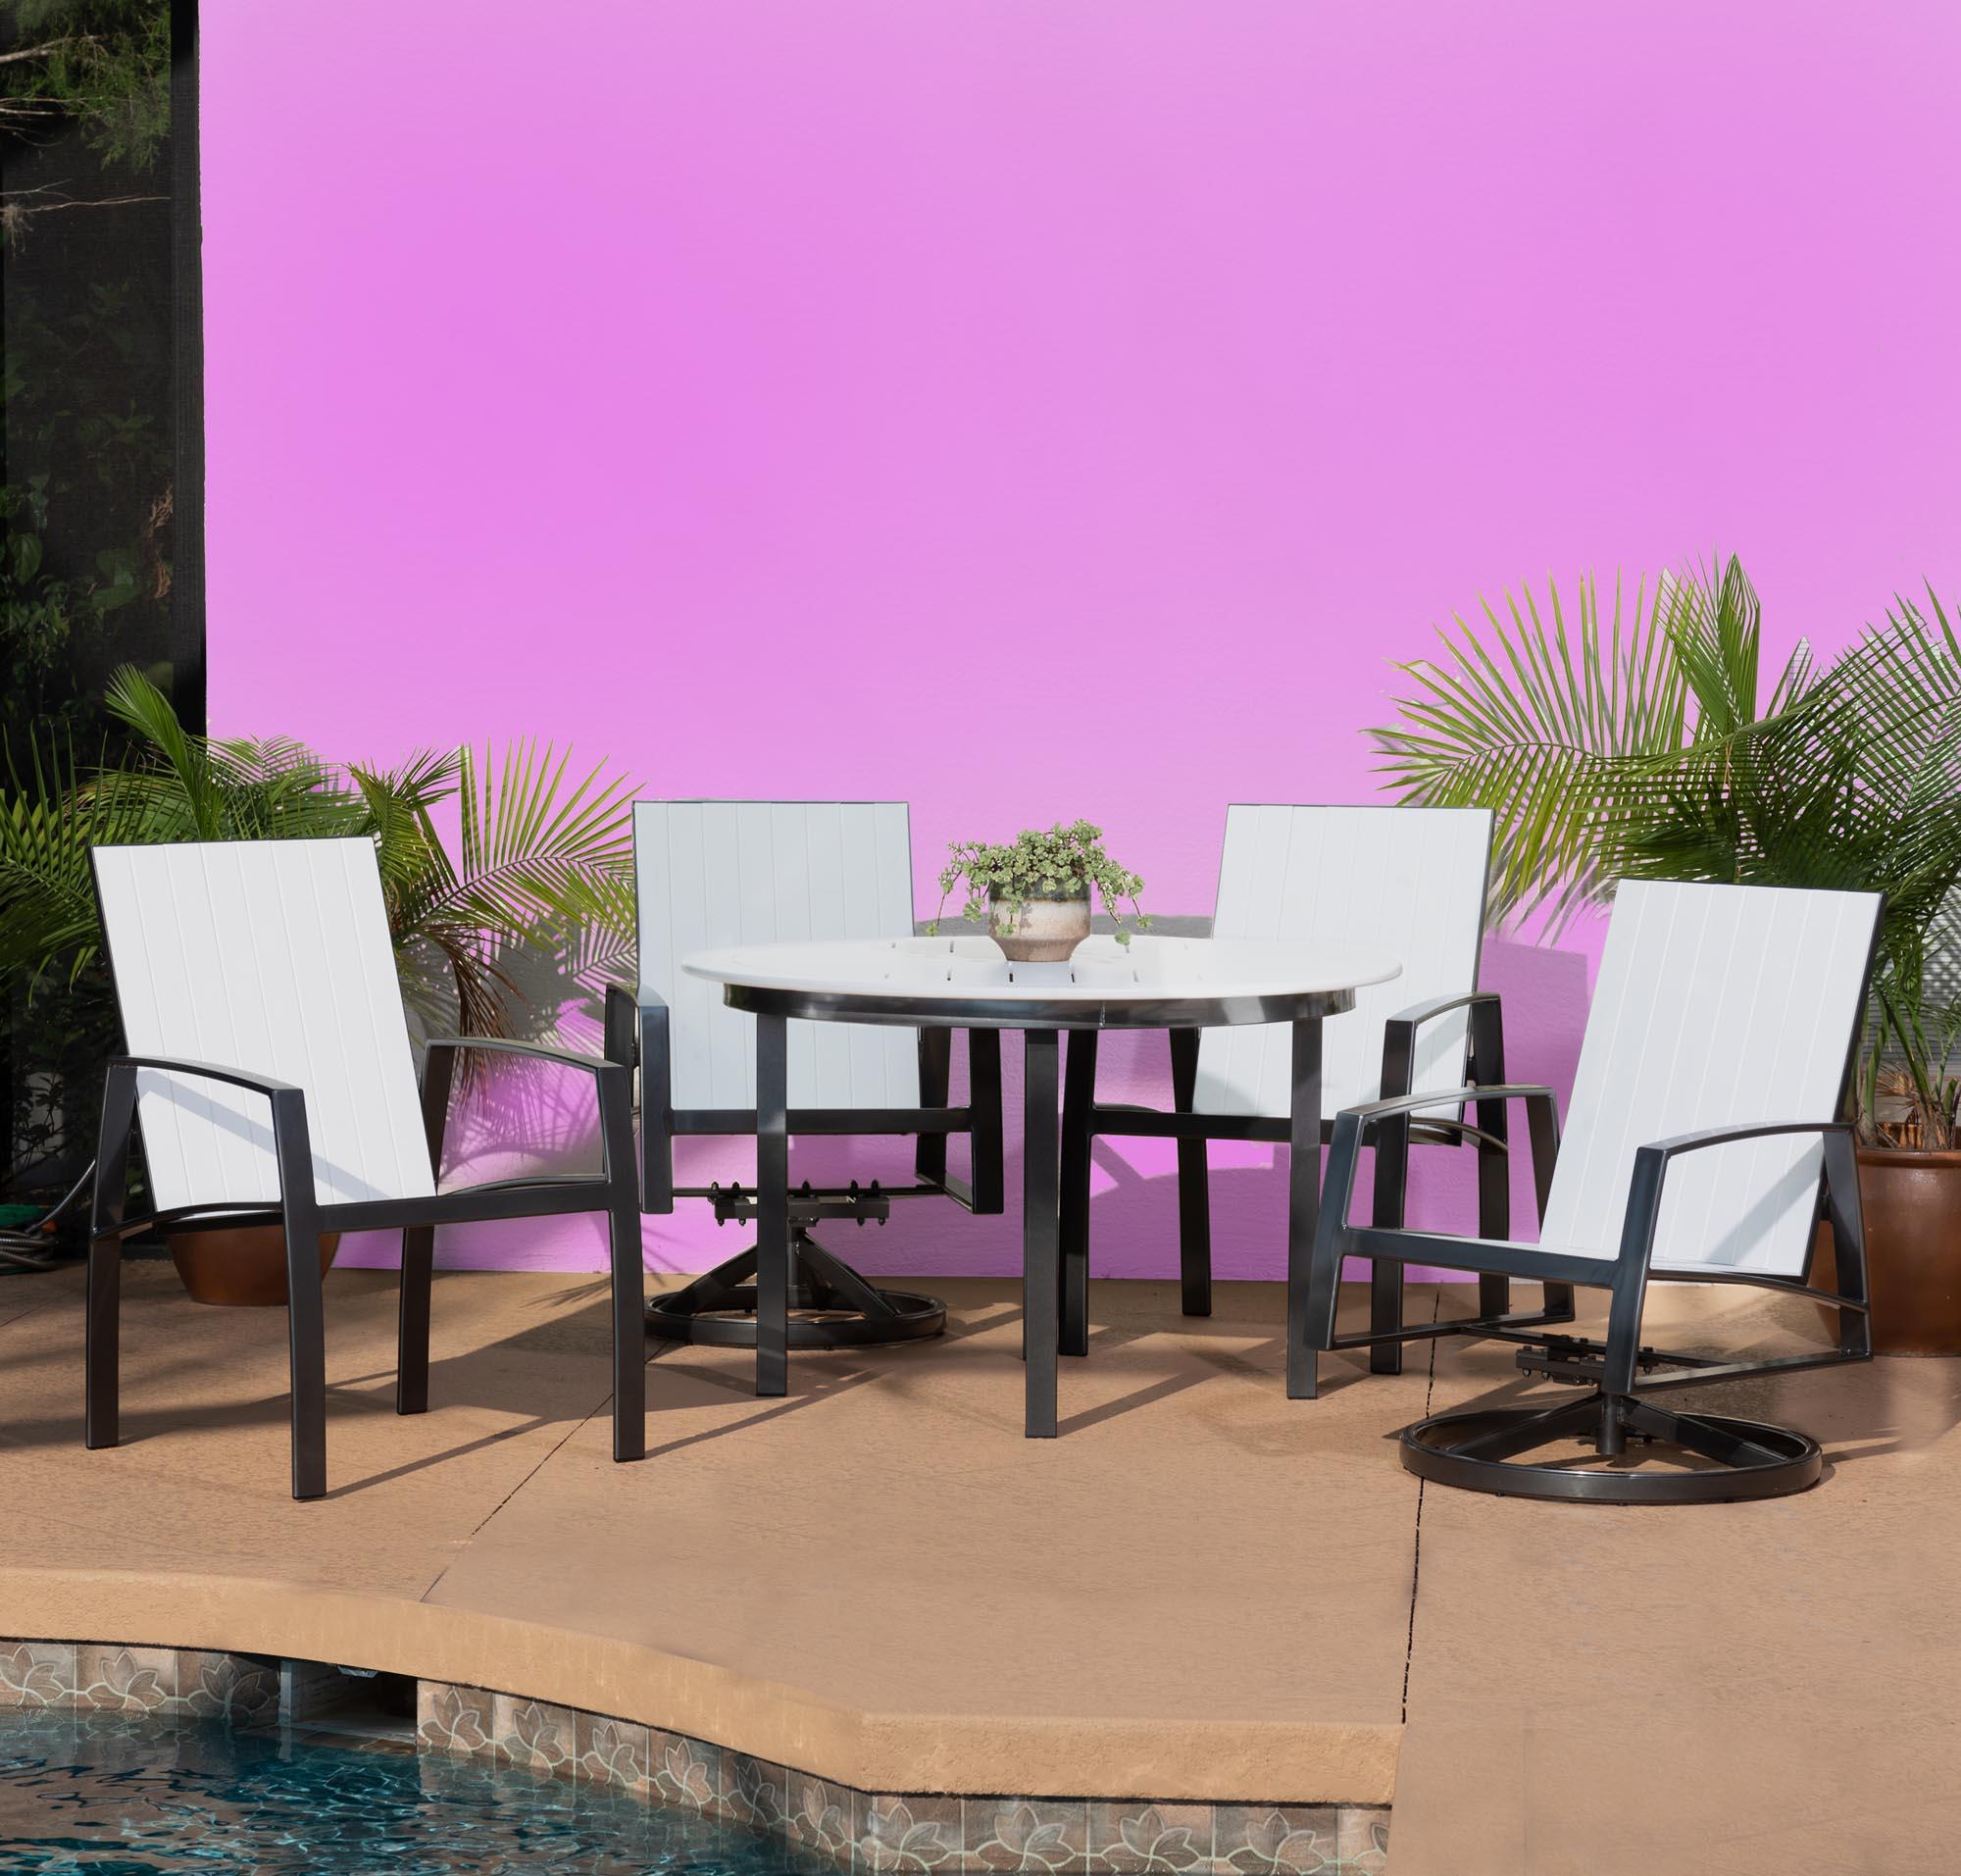 cabana coast outdoor patio furniture naples marco island bonita springs